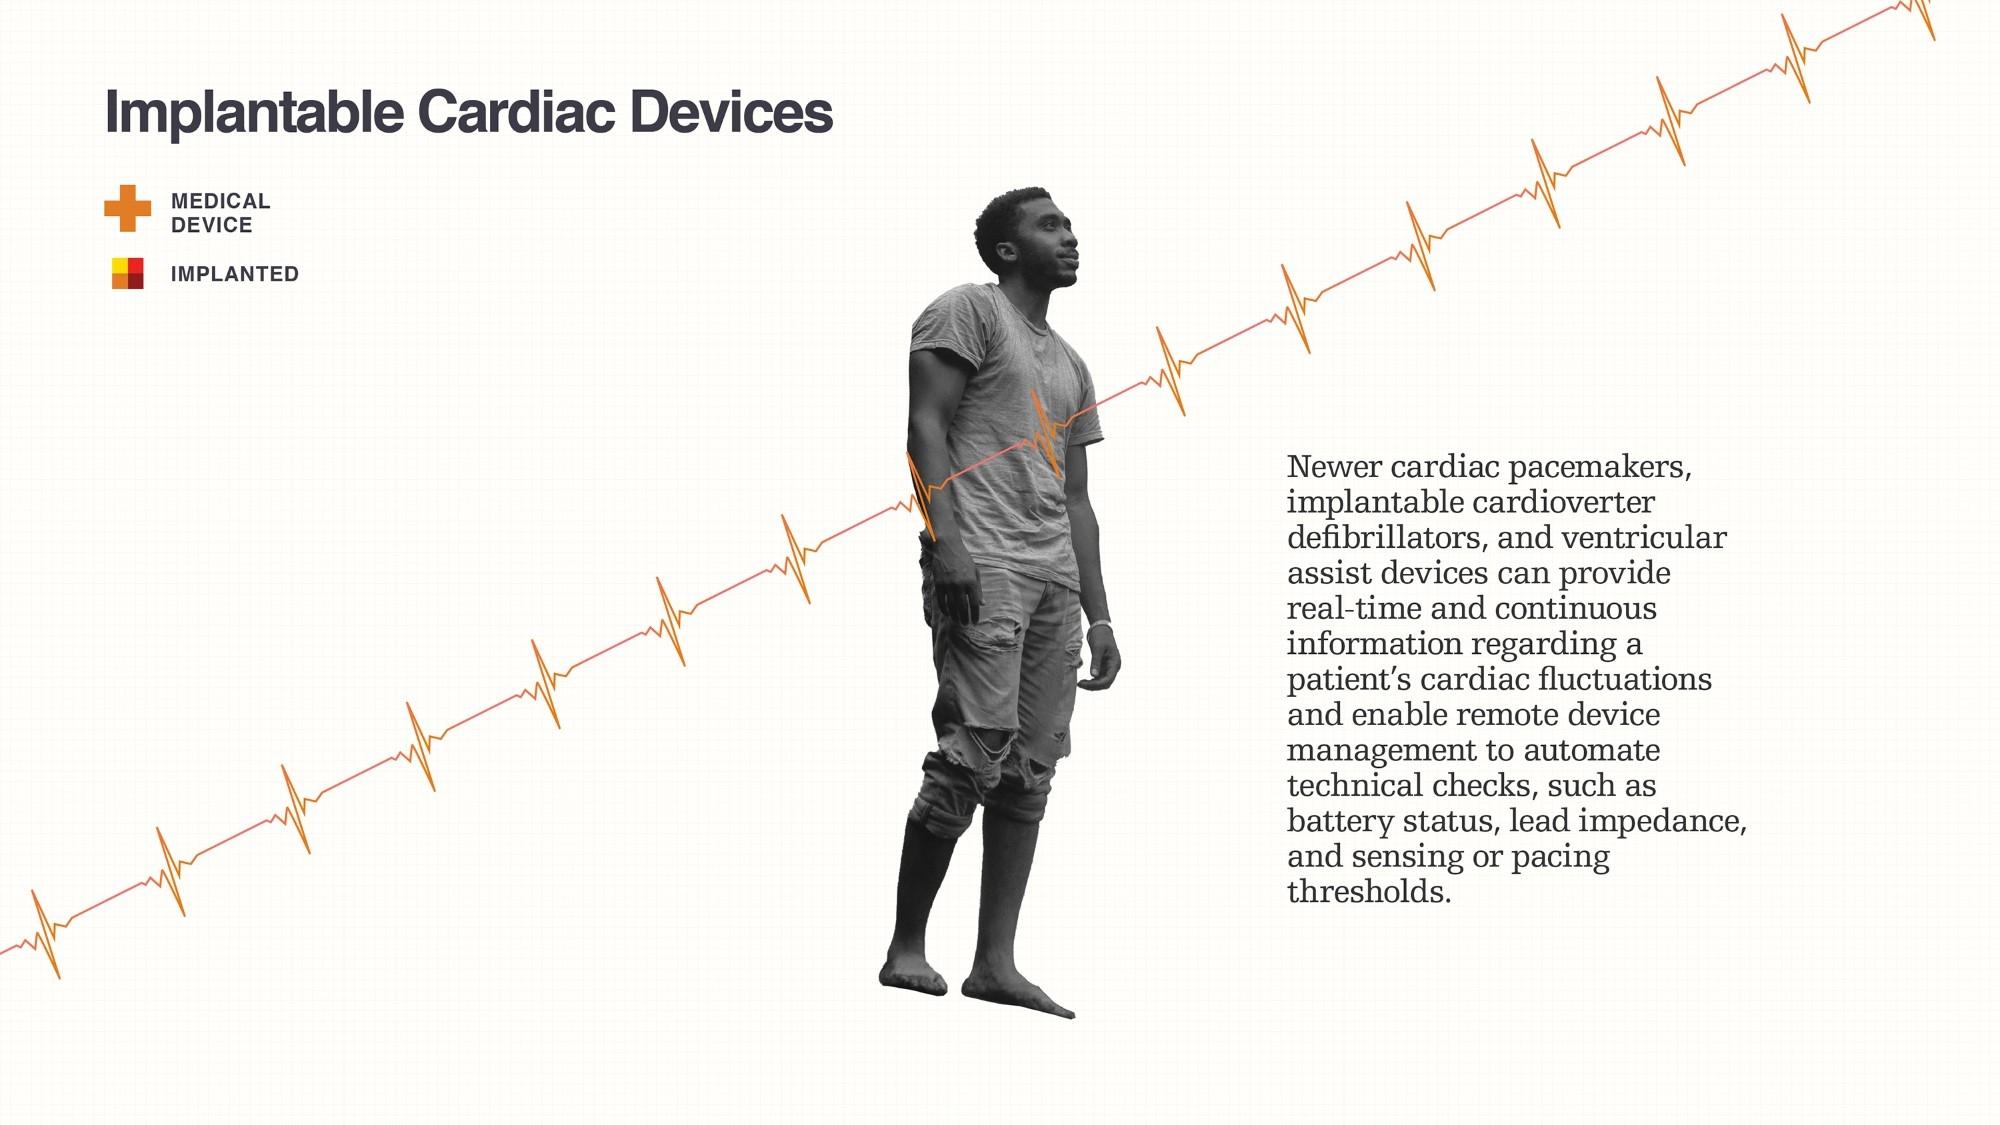 Data visualization illustrating implantable cardiac devices by Gioriga Lupi.